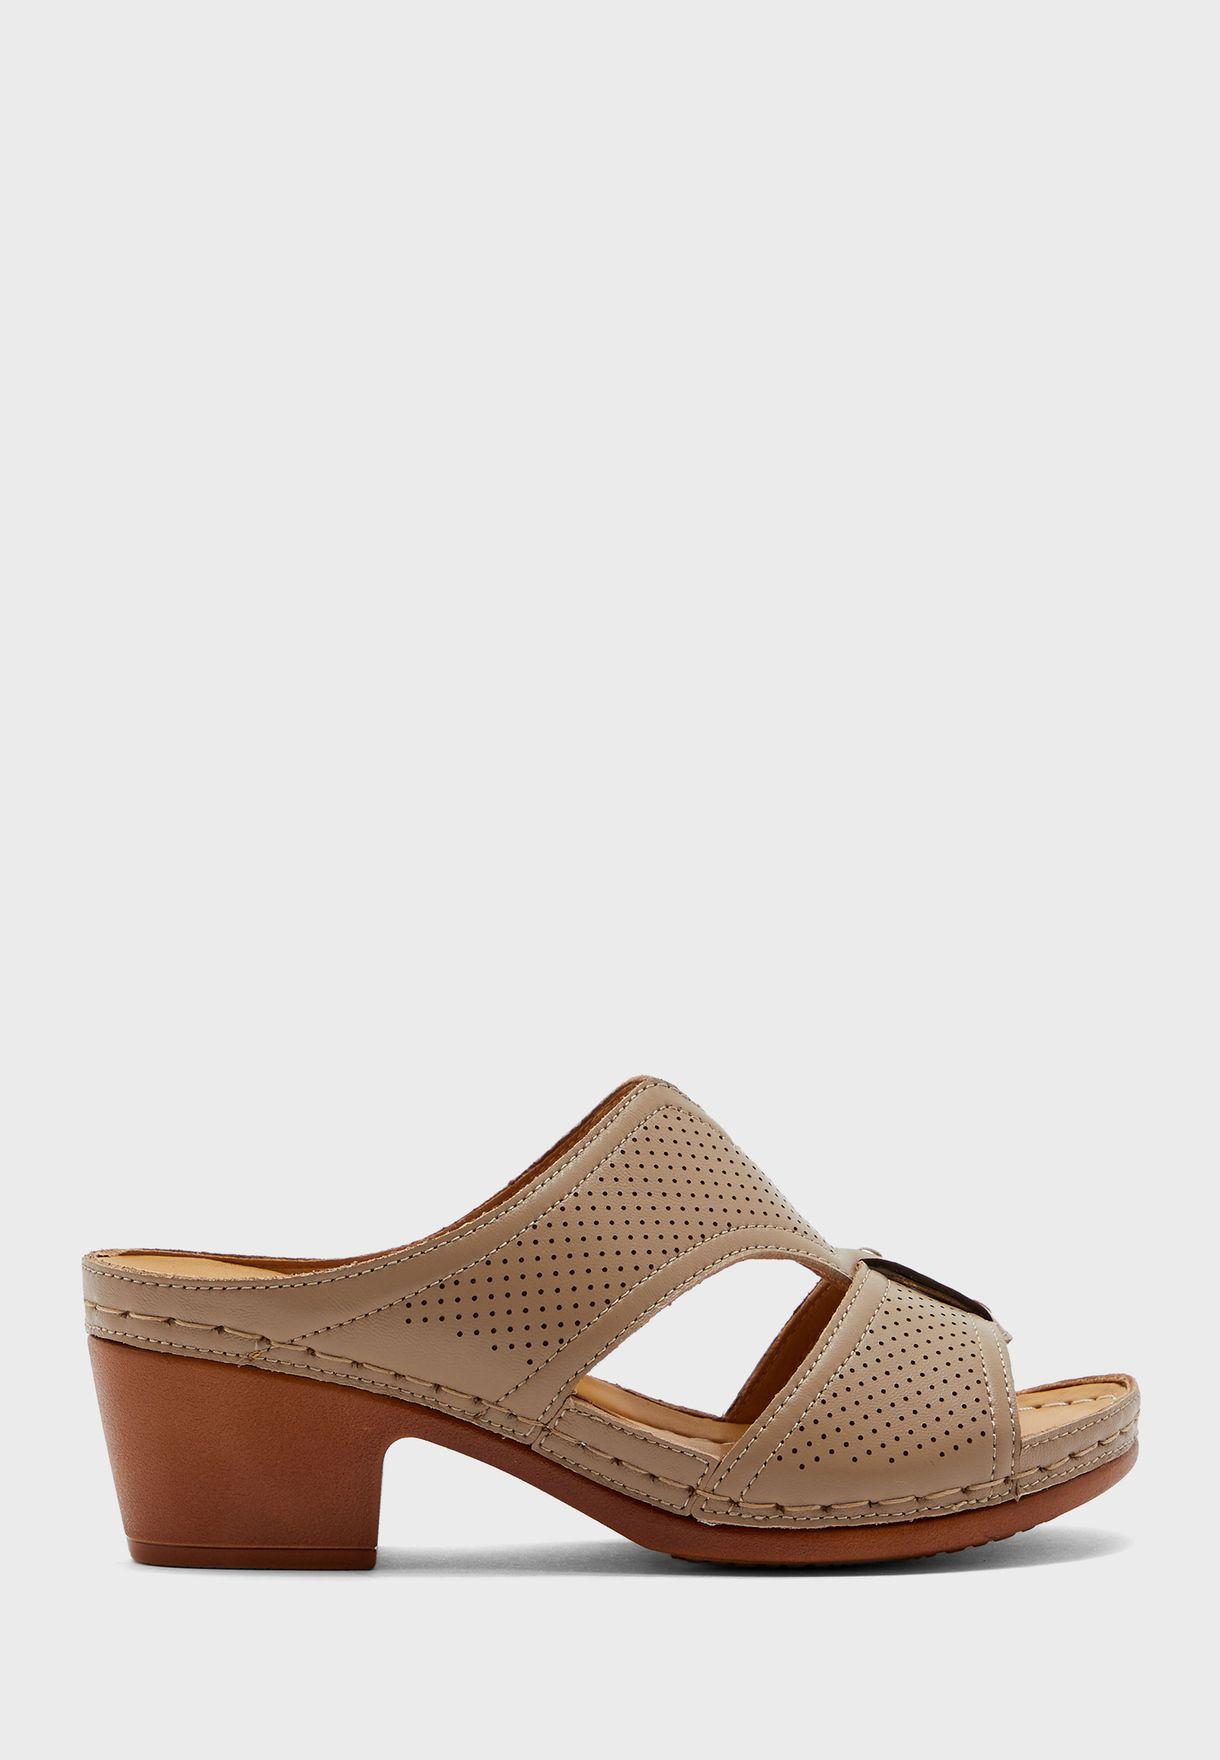 Wide Strap Mid Heel Sandal